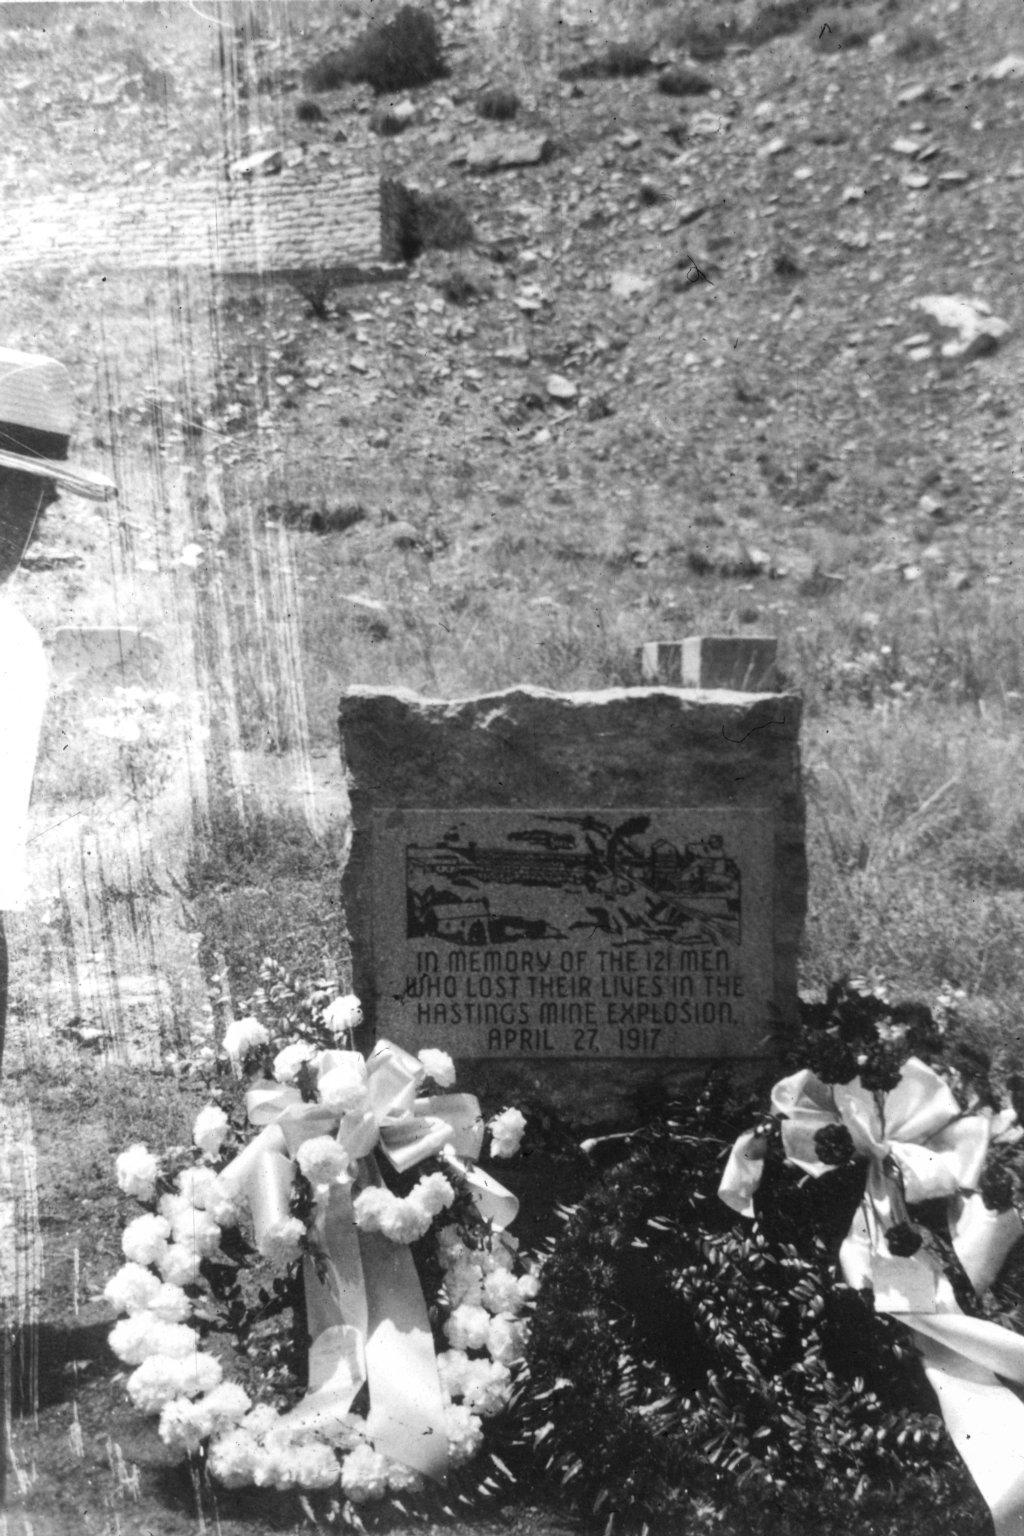 Colorado (indecipherable) 1970s explosion (indecipherable)